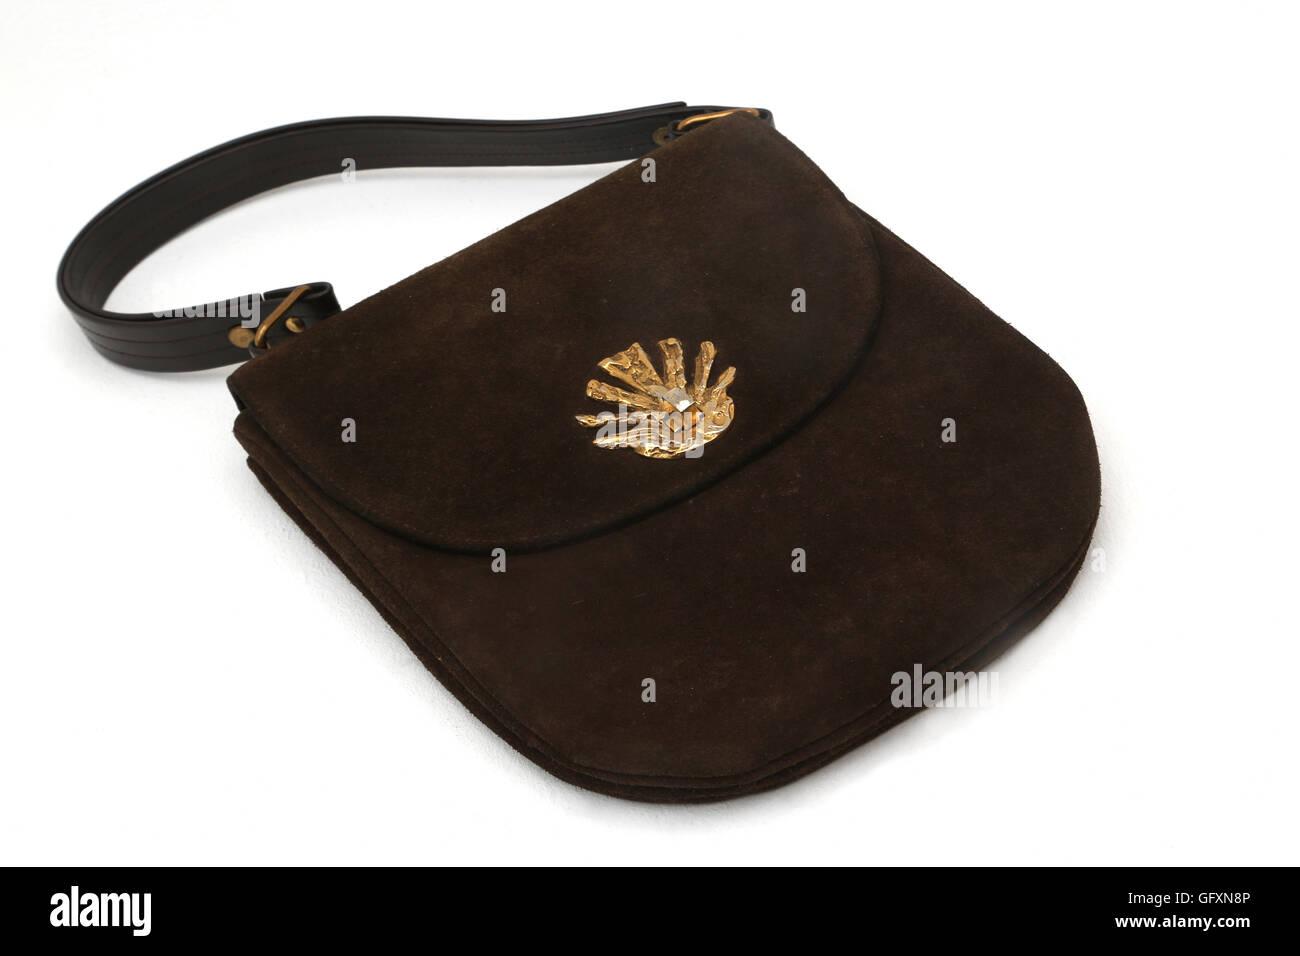 2b8efa112e Vintage 1950 Waldybag avec sac à main en daim marron fermoir métal Photo  Stock